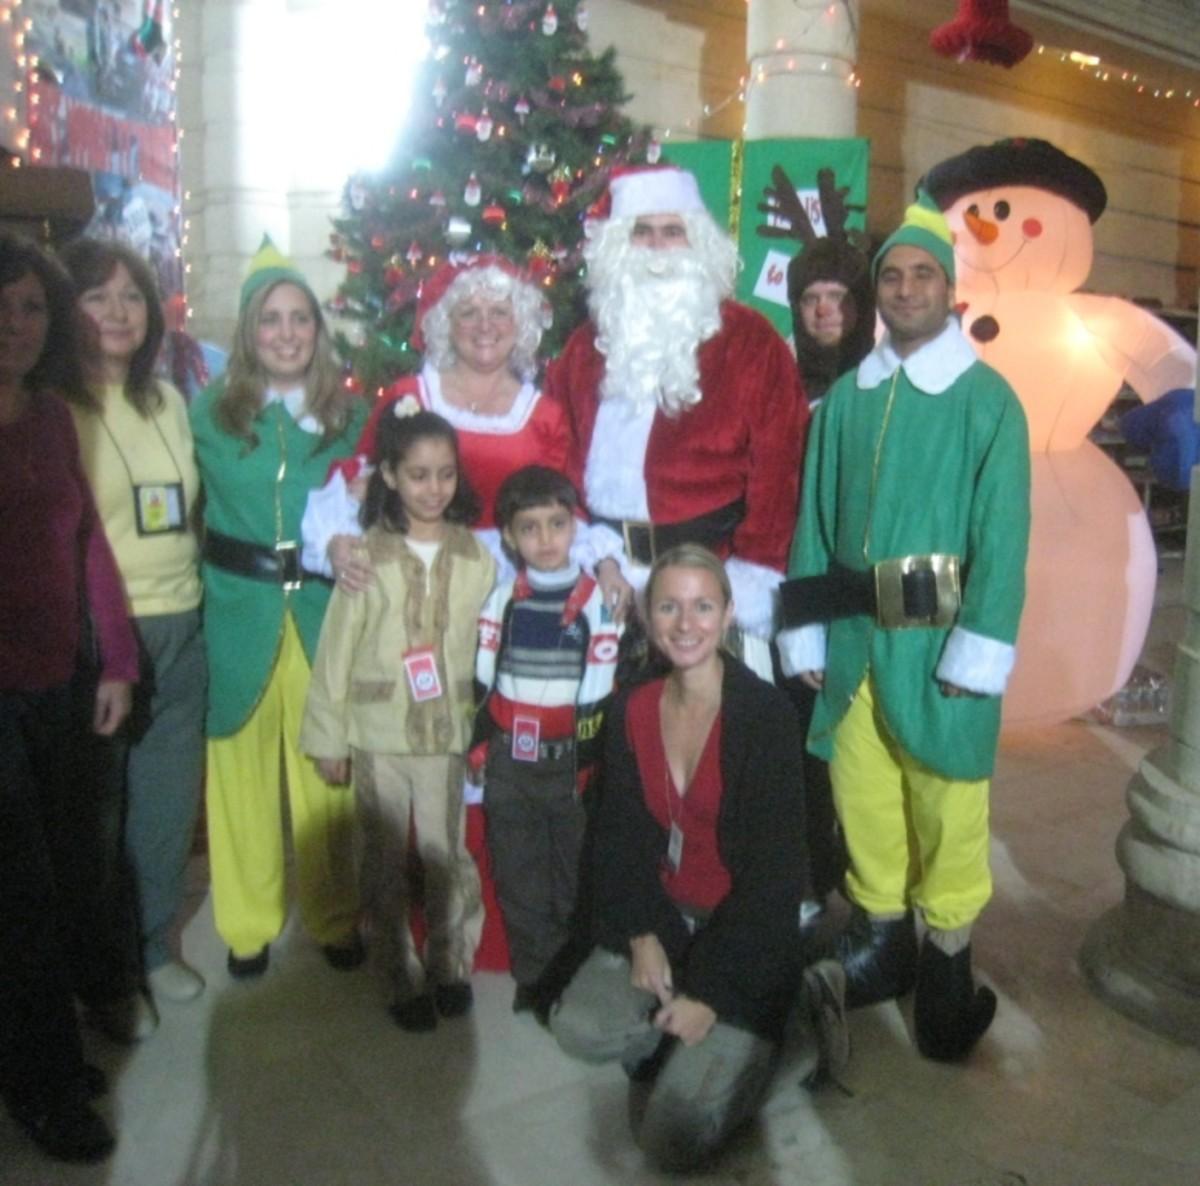 Father Christmas visits the hospital